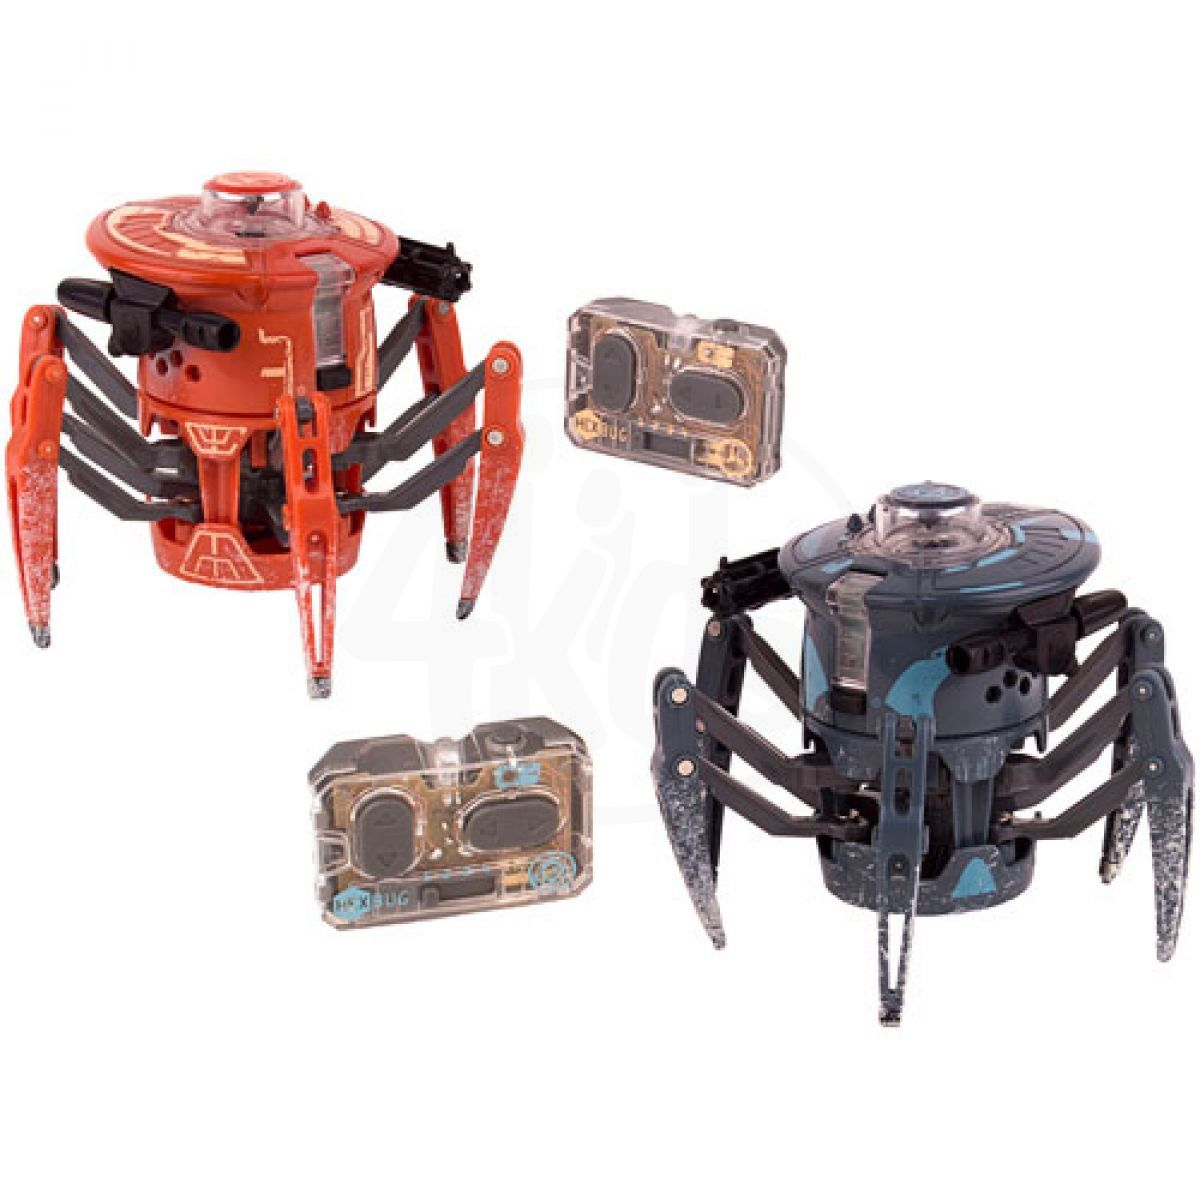 Hexbug Bojoví pavouci 2.0 Tower set